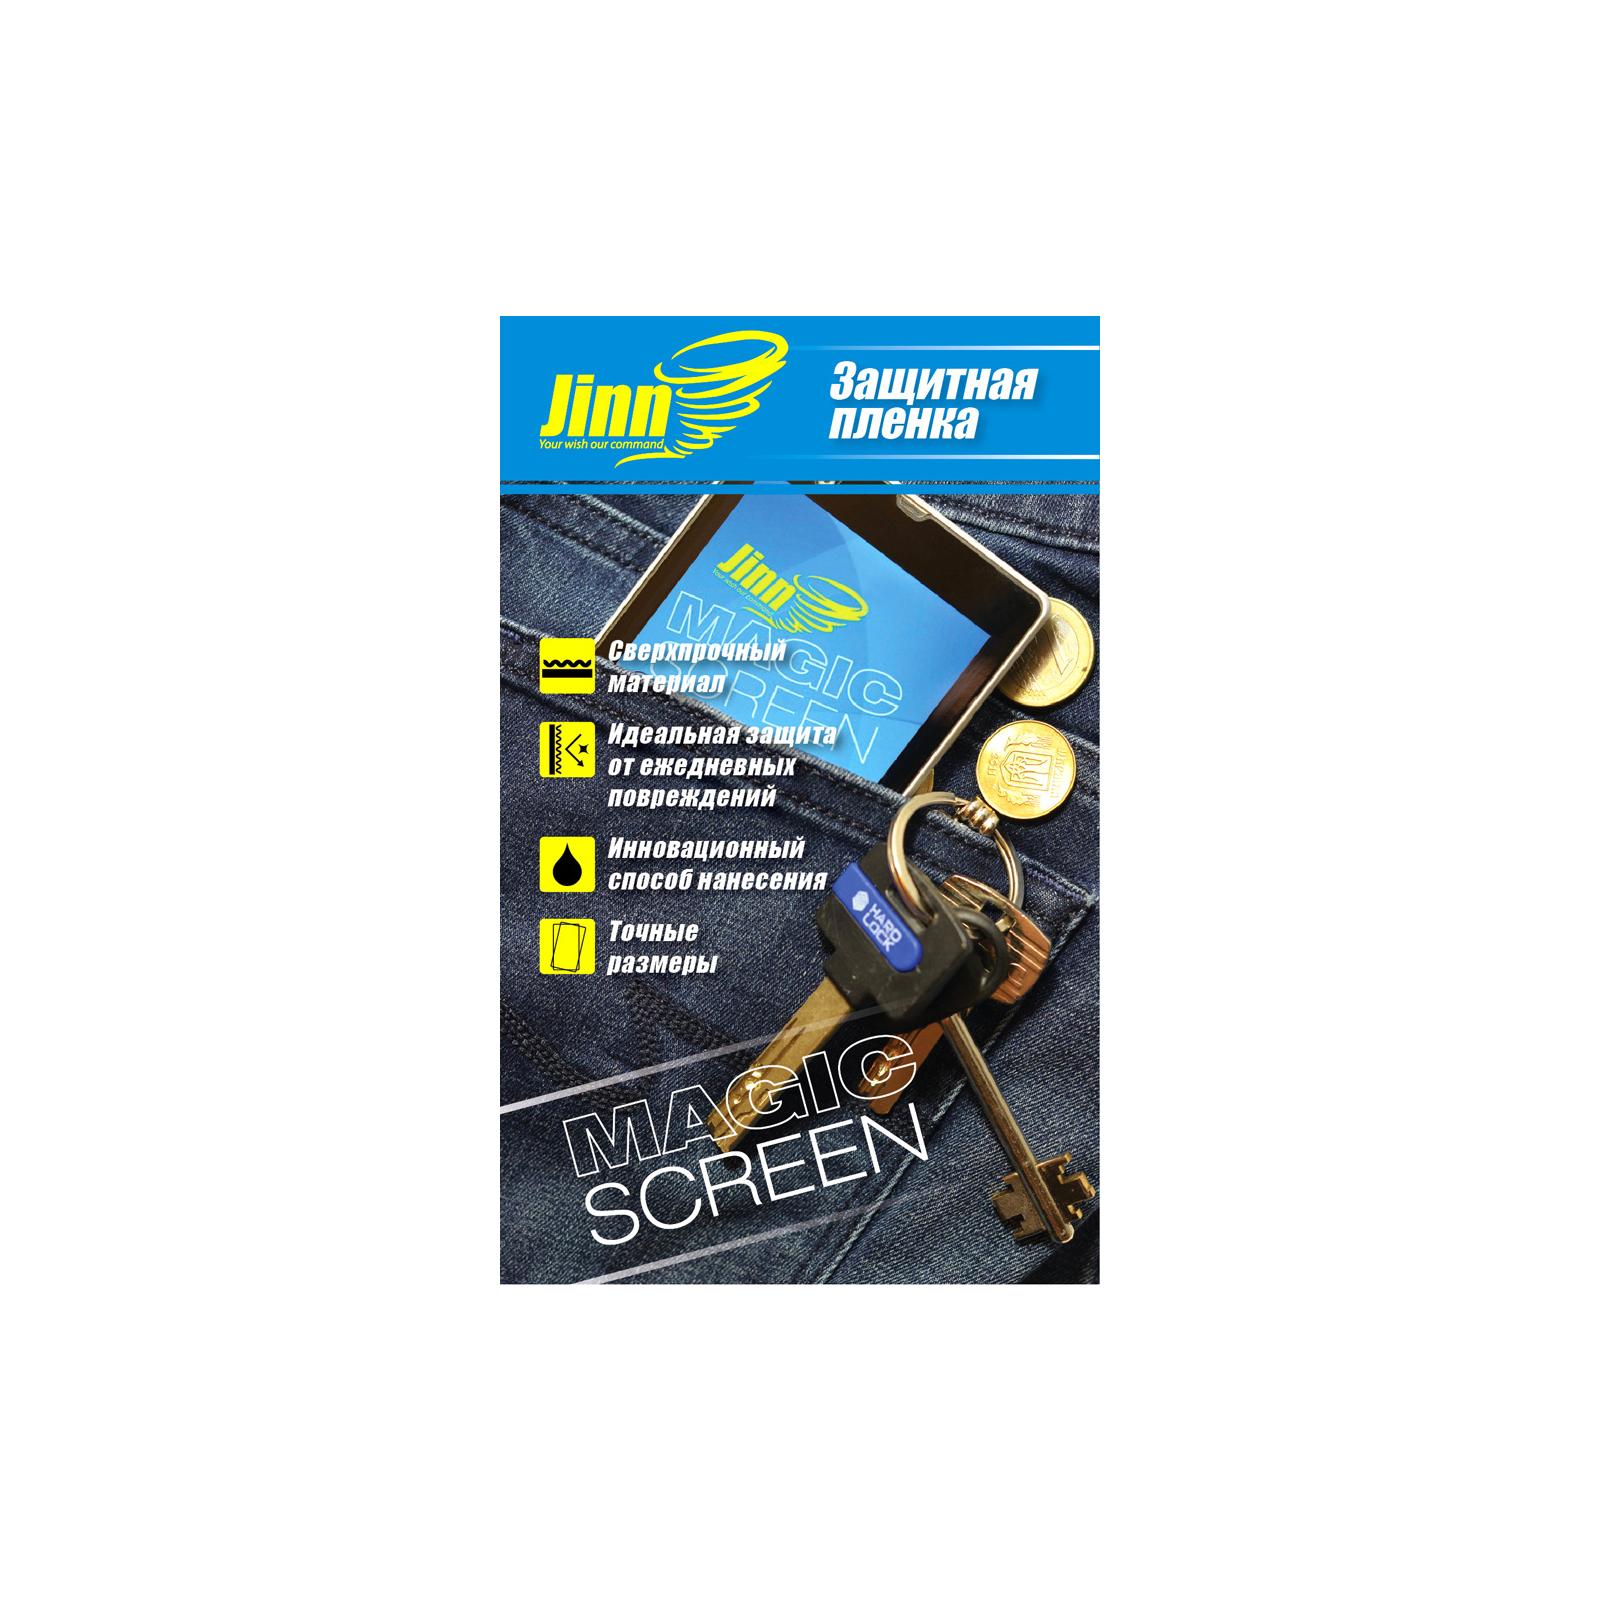 Пленка защитная JINN ультрапрочная Magic Screen для LG Optimus L7 P705 (LG Optimus L7 front)